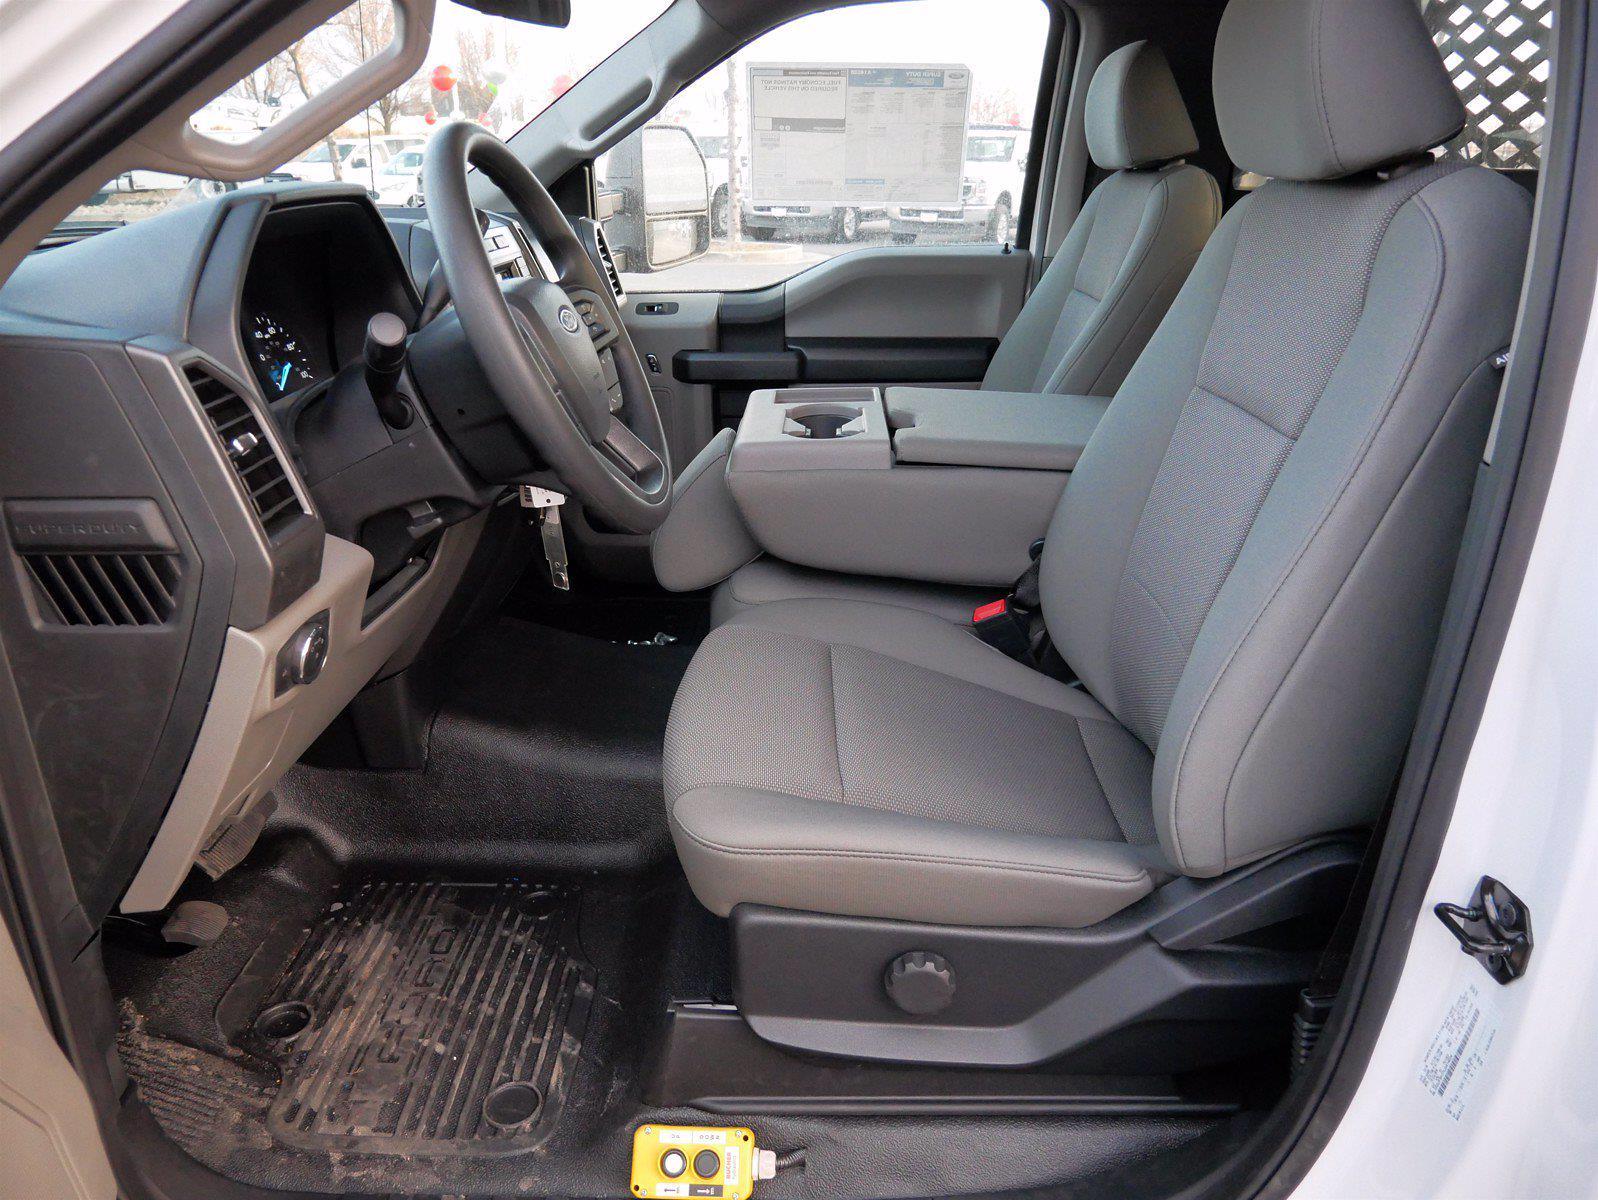 2021 Ford F-550 Regular Cab DRW 4x4, Scelzi Dump Body #64083 - photo 13